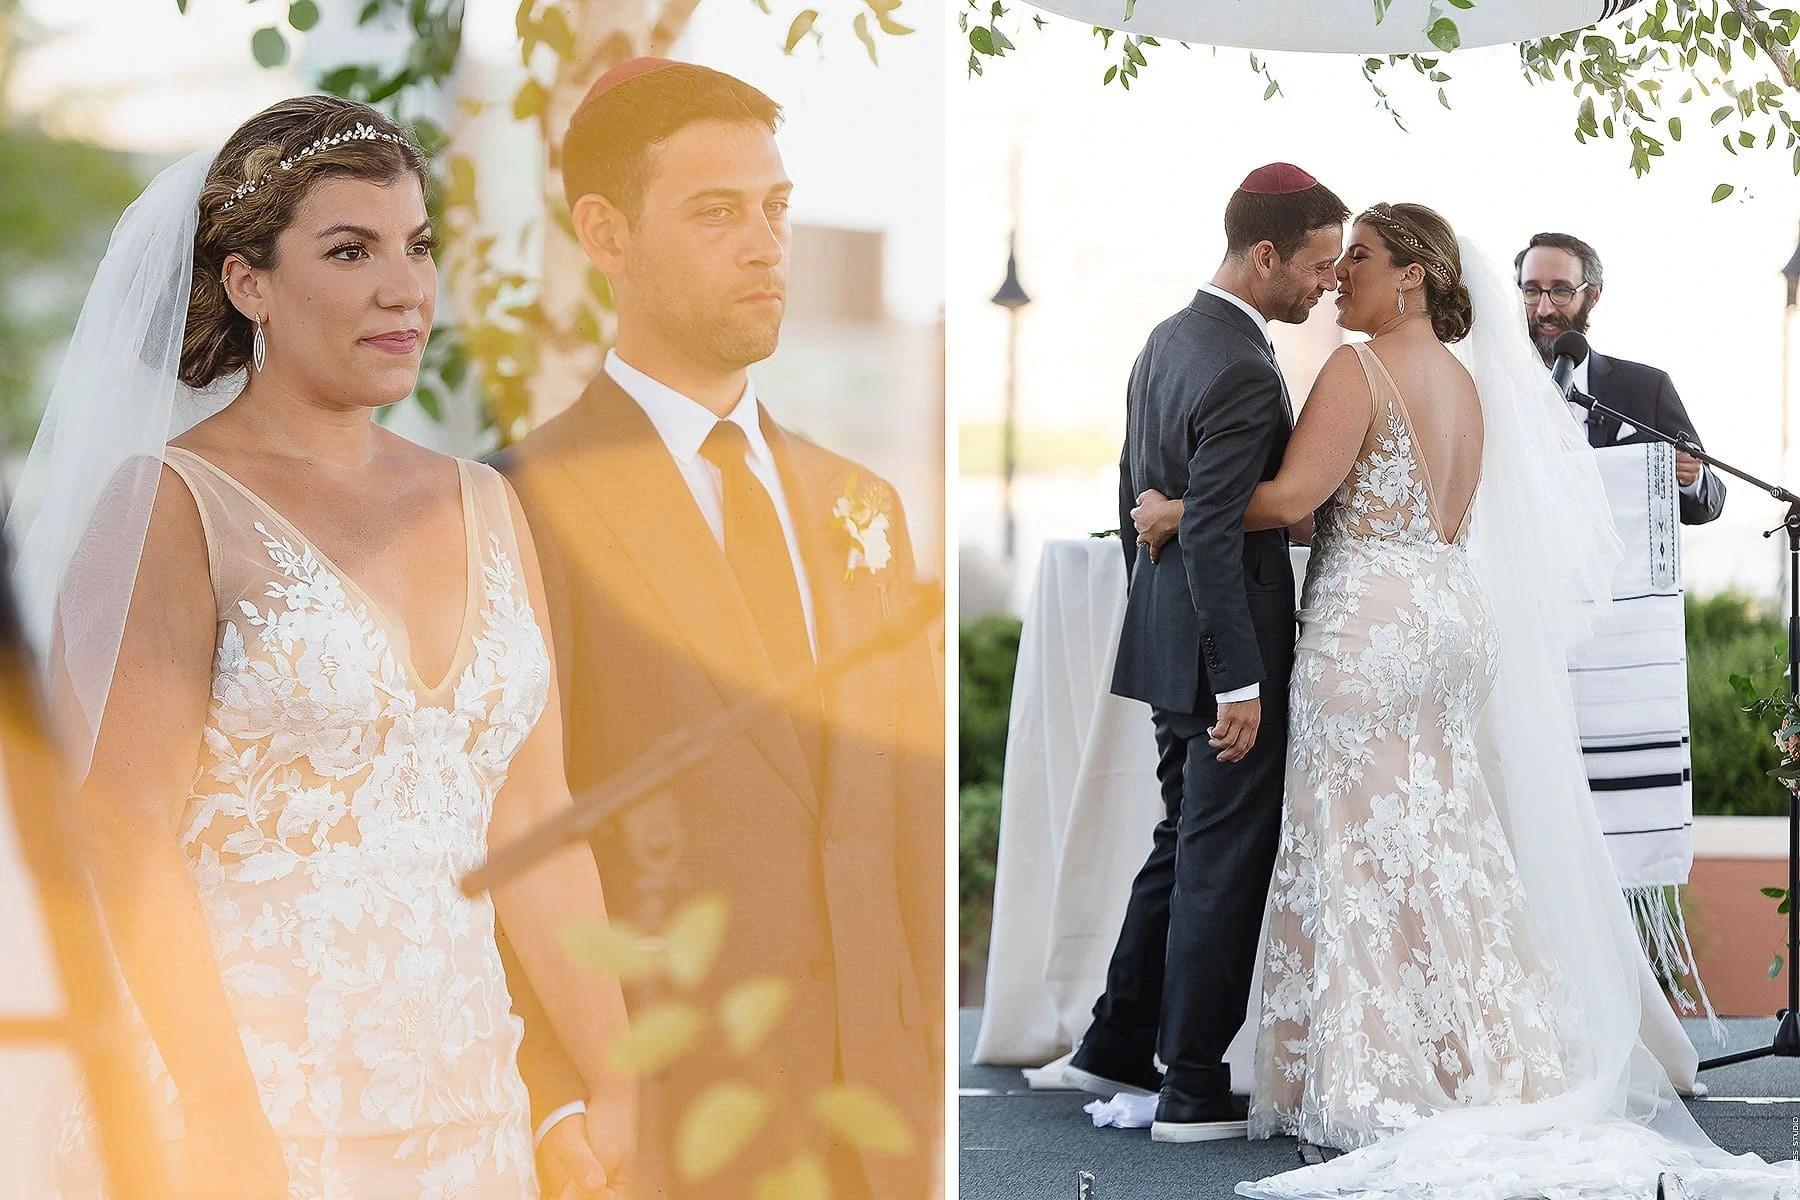 New Jersey Hyatt Regency Wedding Ceremony